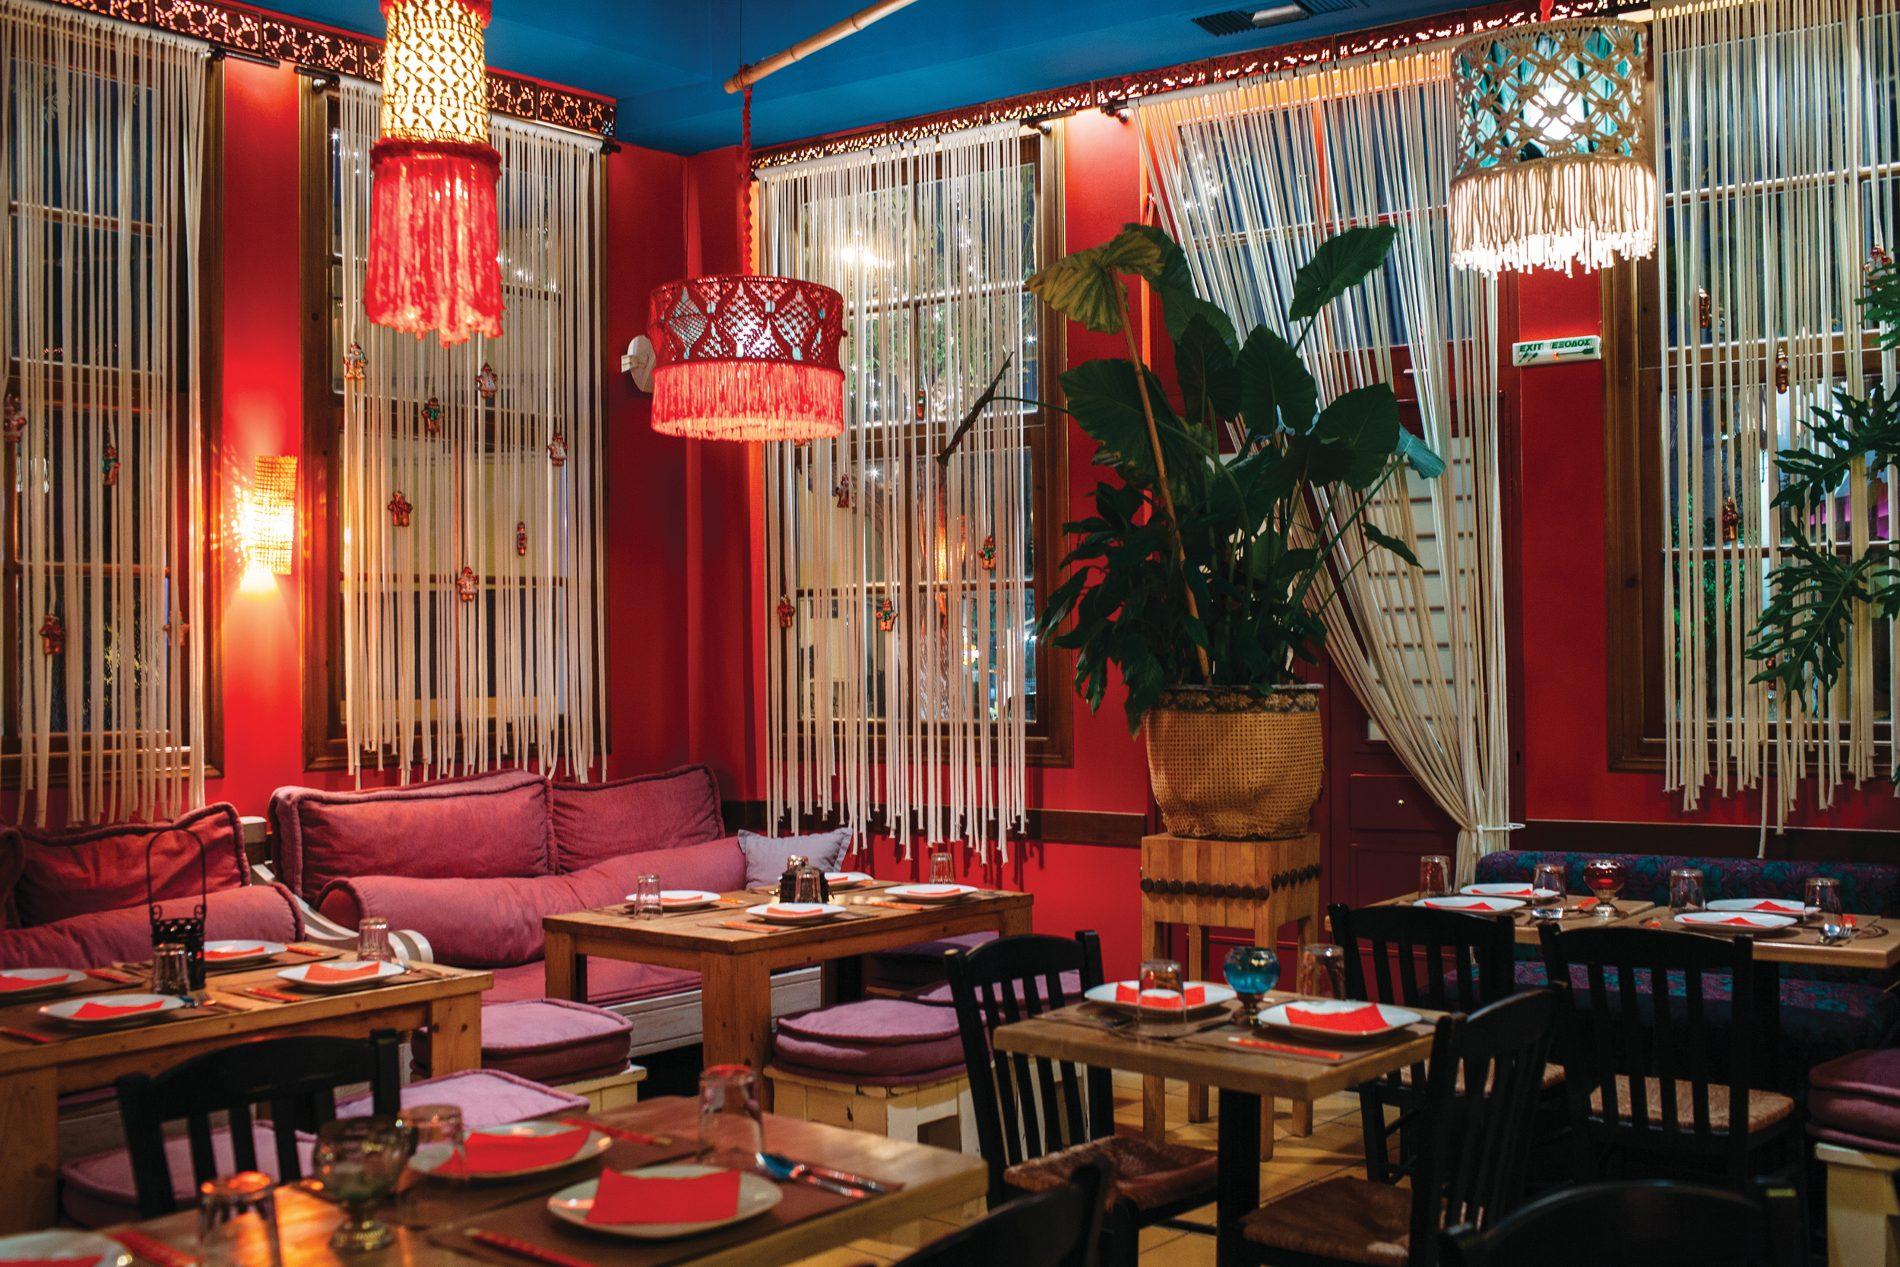 Andaman  in Kato Petralona travels you to Thailand through delicious plates. Source:  Lifo